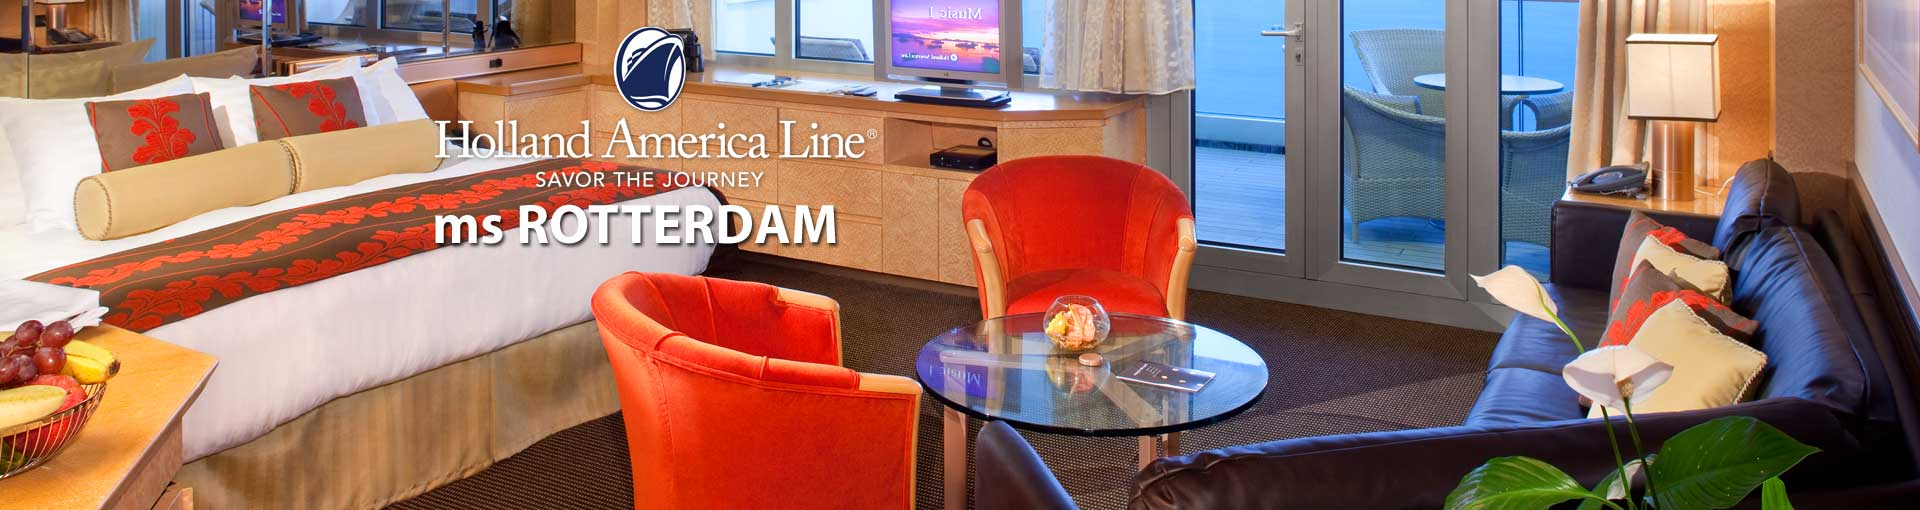 Holland America ms Rotterdam cruise ship